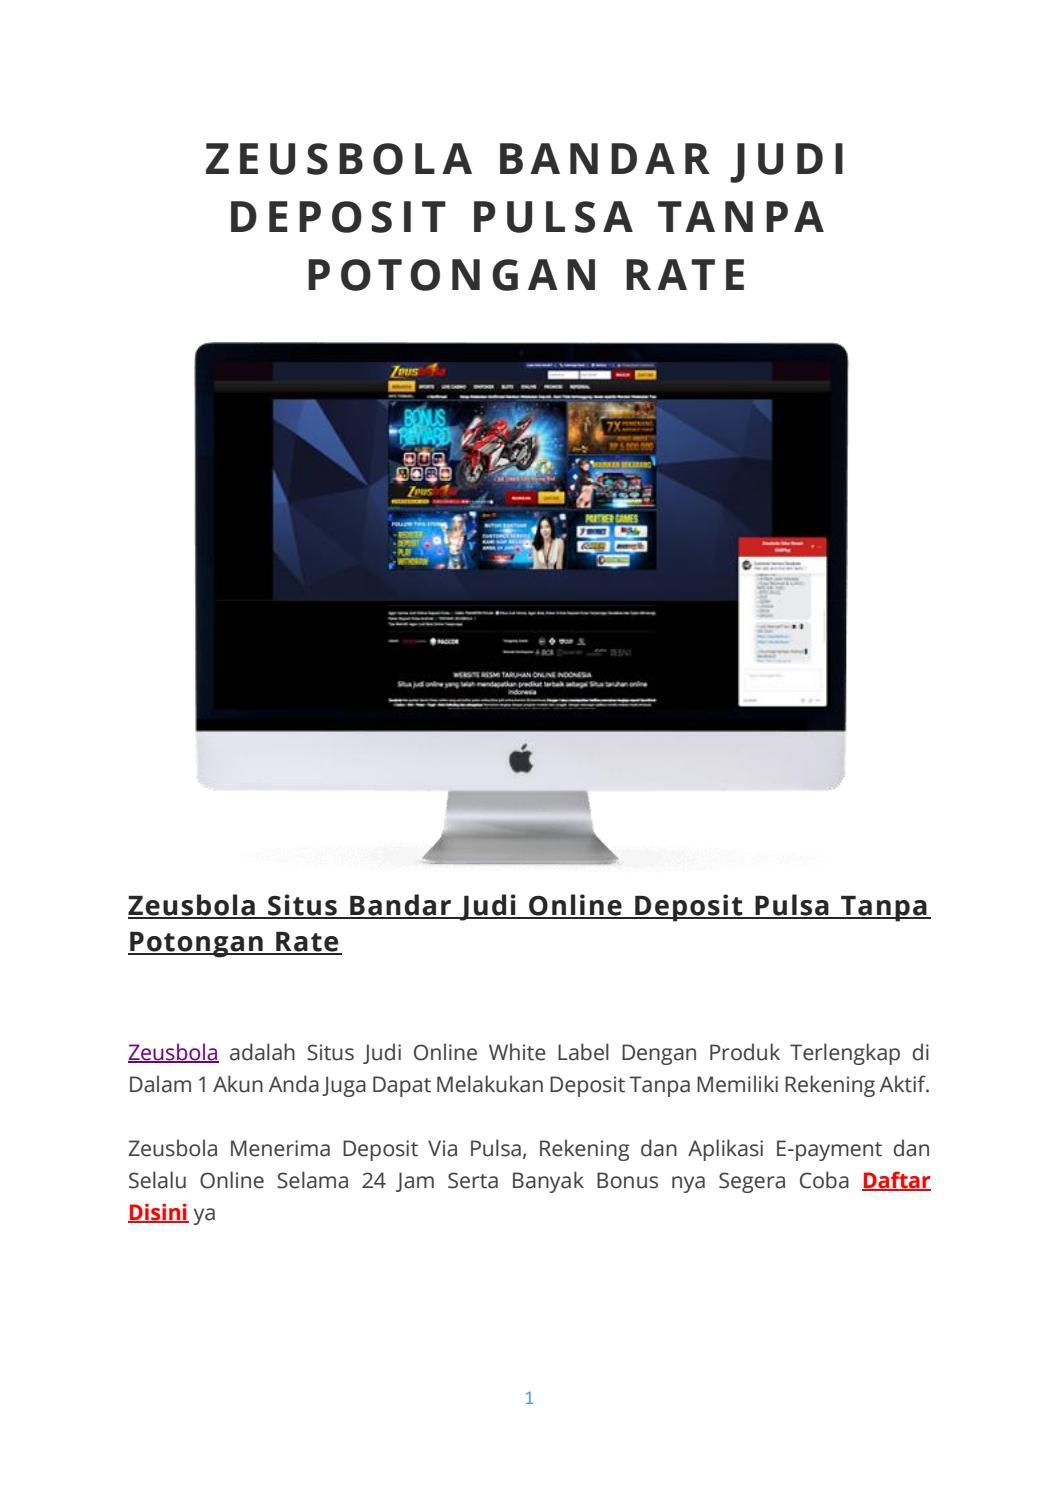 Zeusbola Bandar Judi Deposit Pulsa Tanpa Potongan Rate By Marketing Zeusbola Issuu